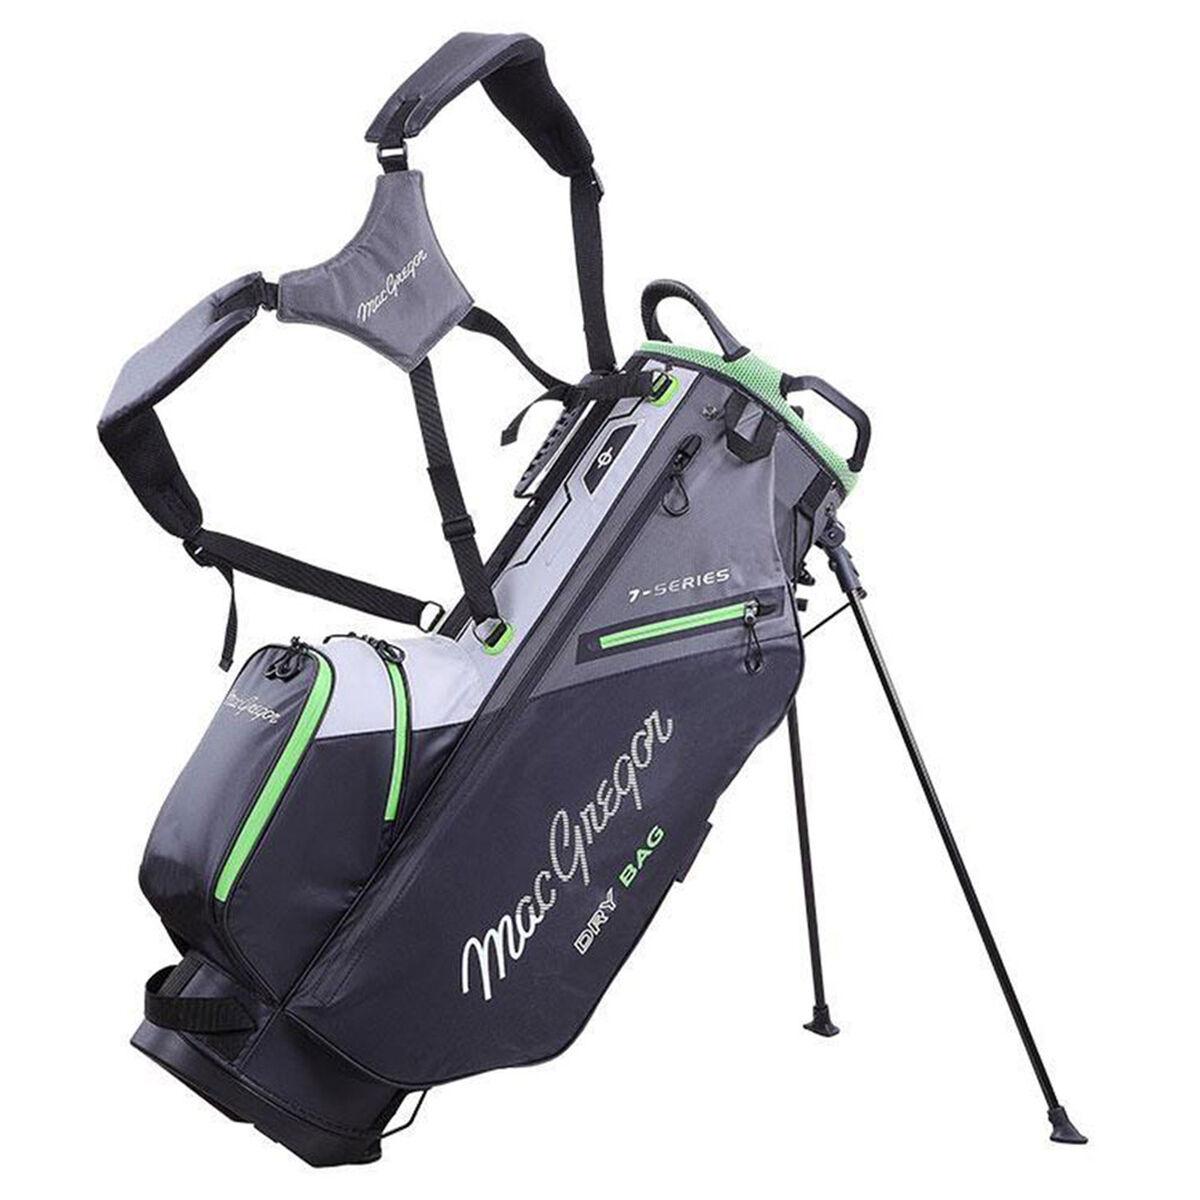 MacGregor 7-Series Water-Resistant Golf Stand Bag, Black/grey   American Golf